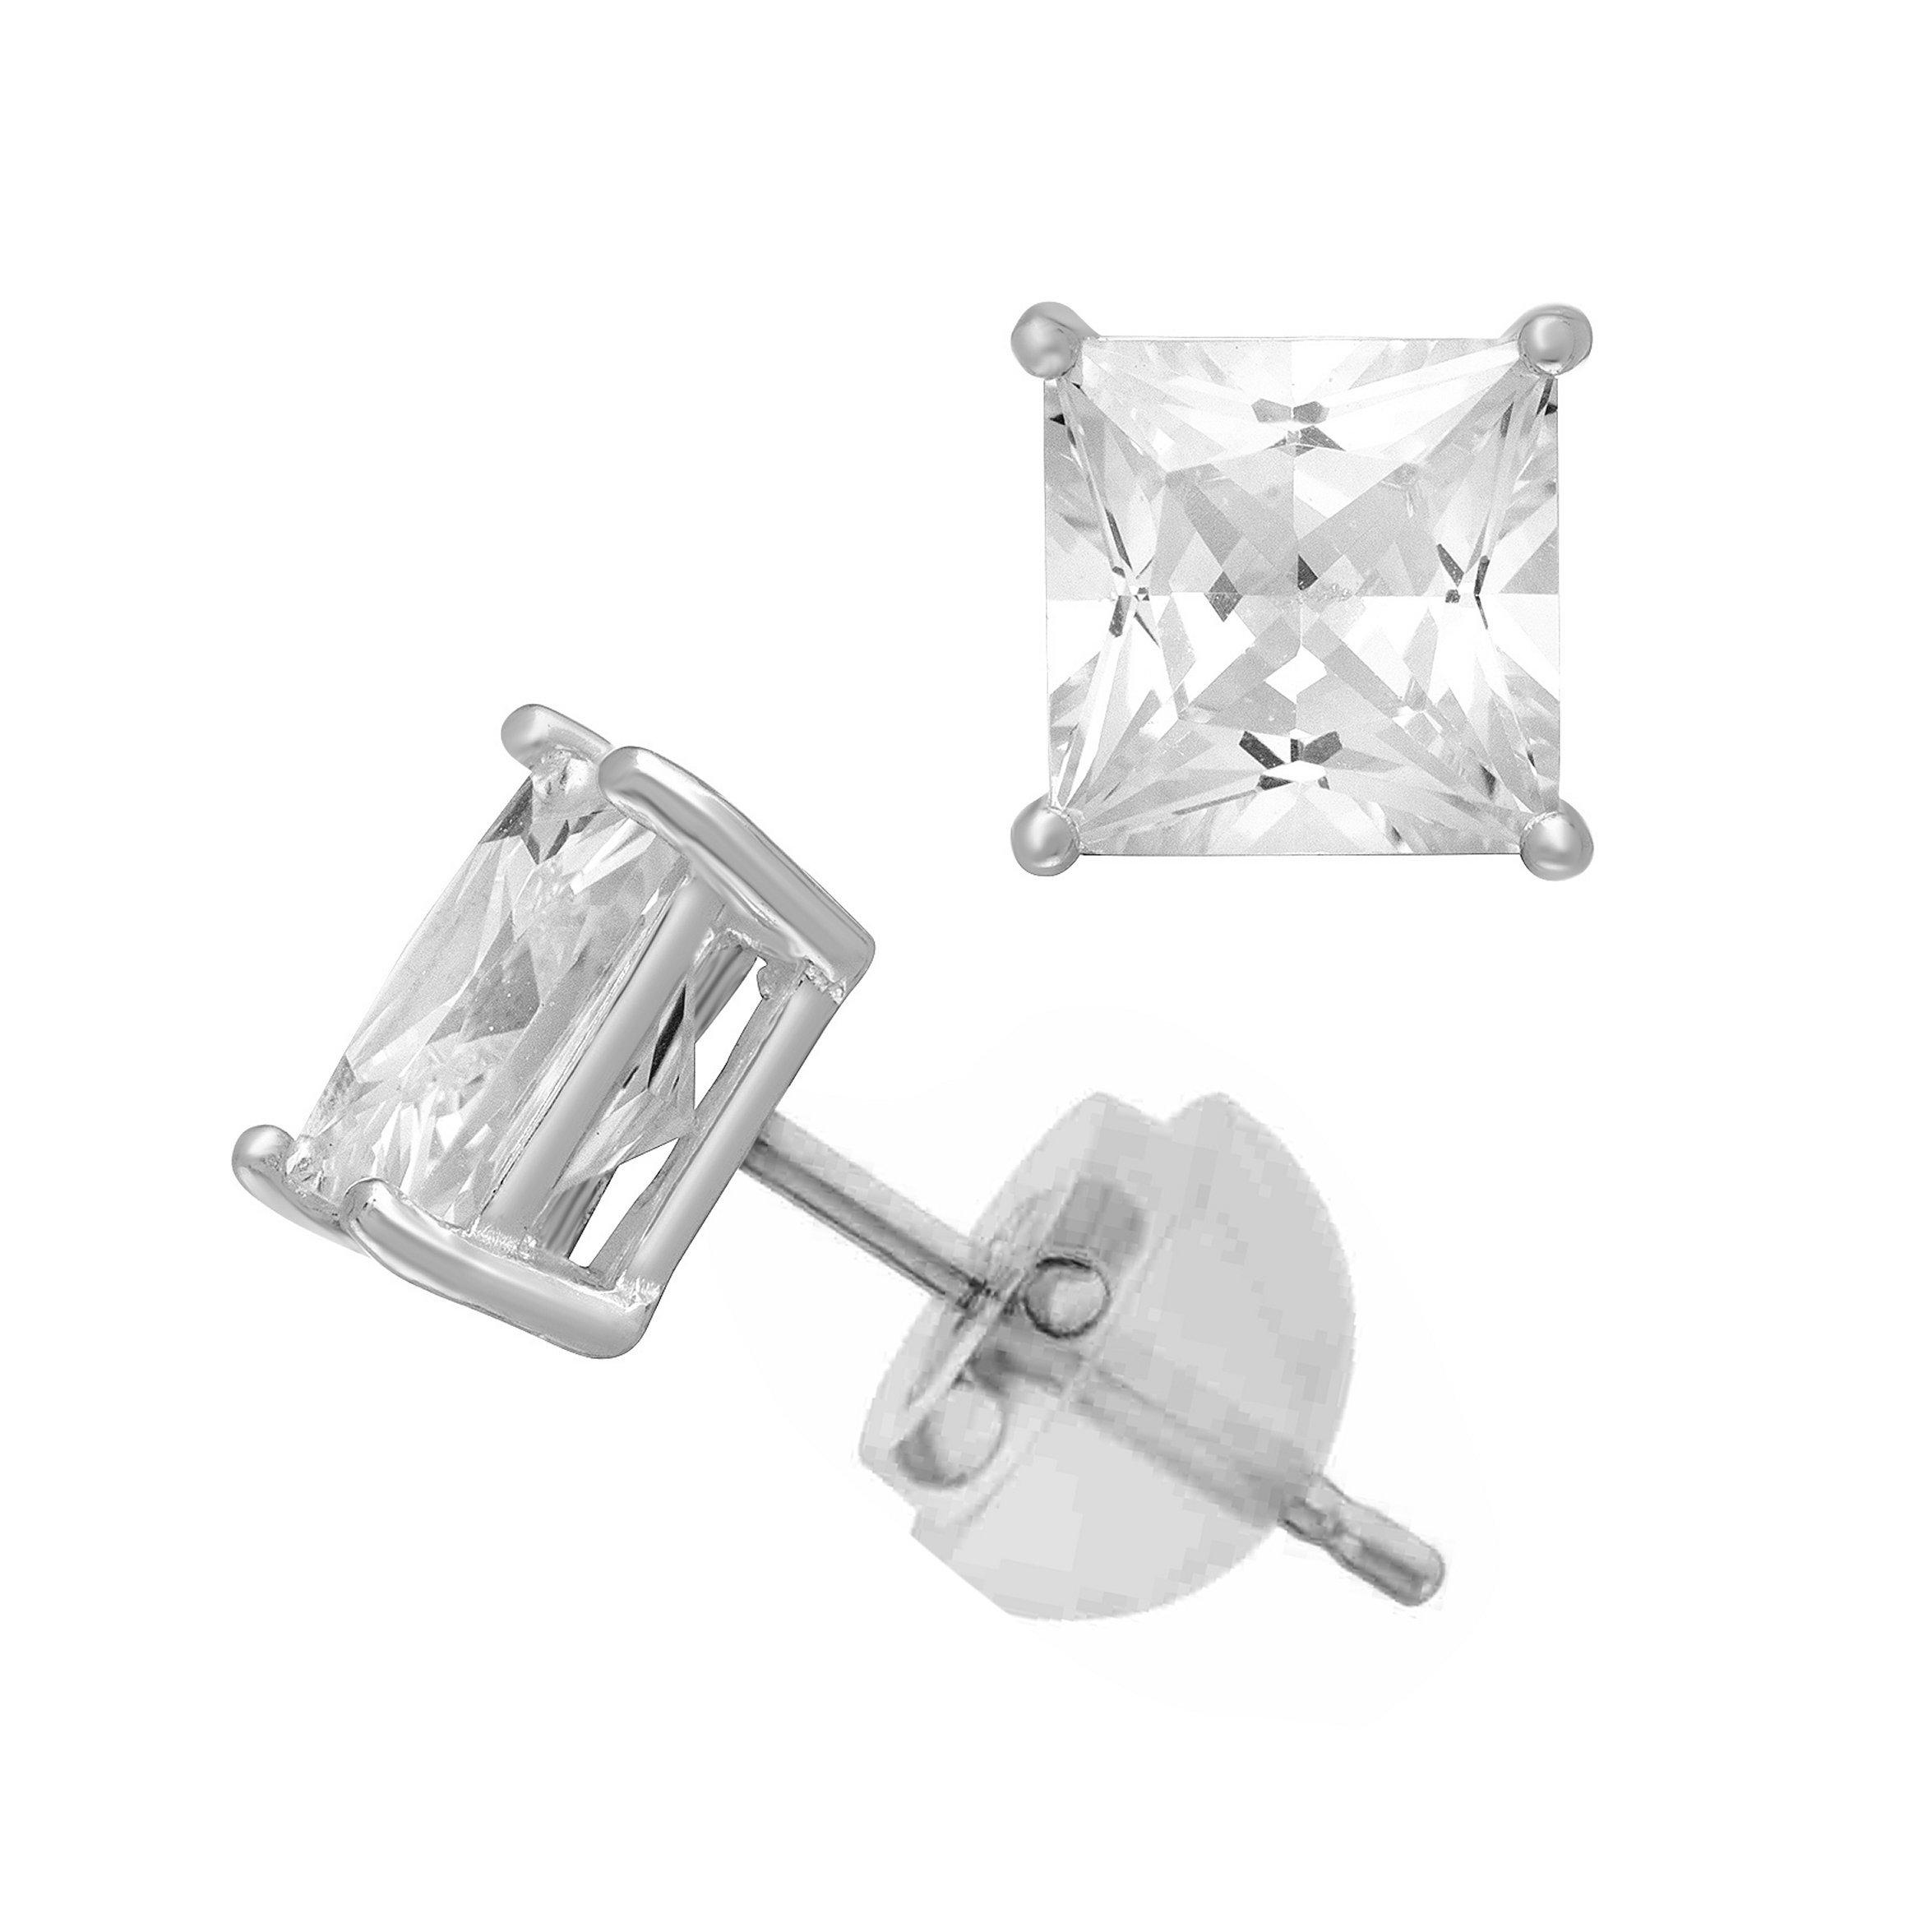 14K White Gold Cubic Zirconia Princess Cut CZ 7.0 mm Stud Earring Comfort Fit